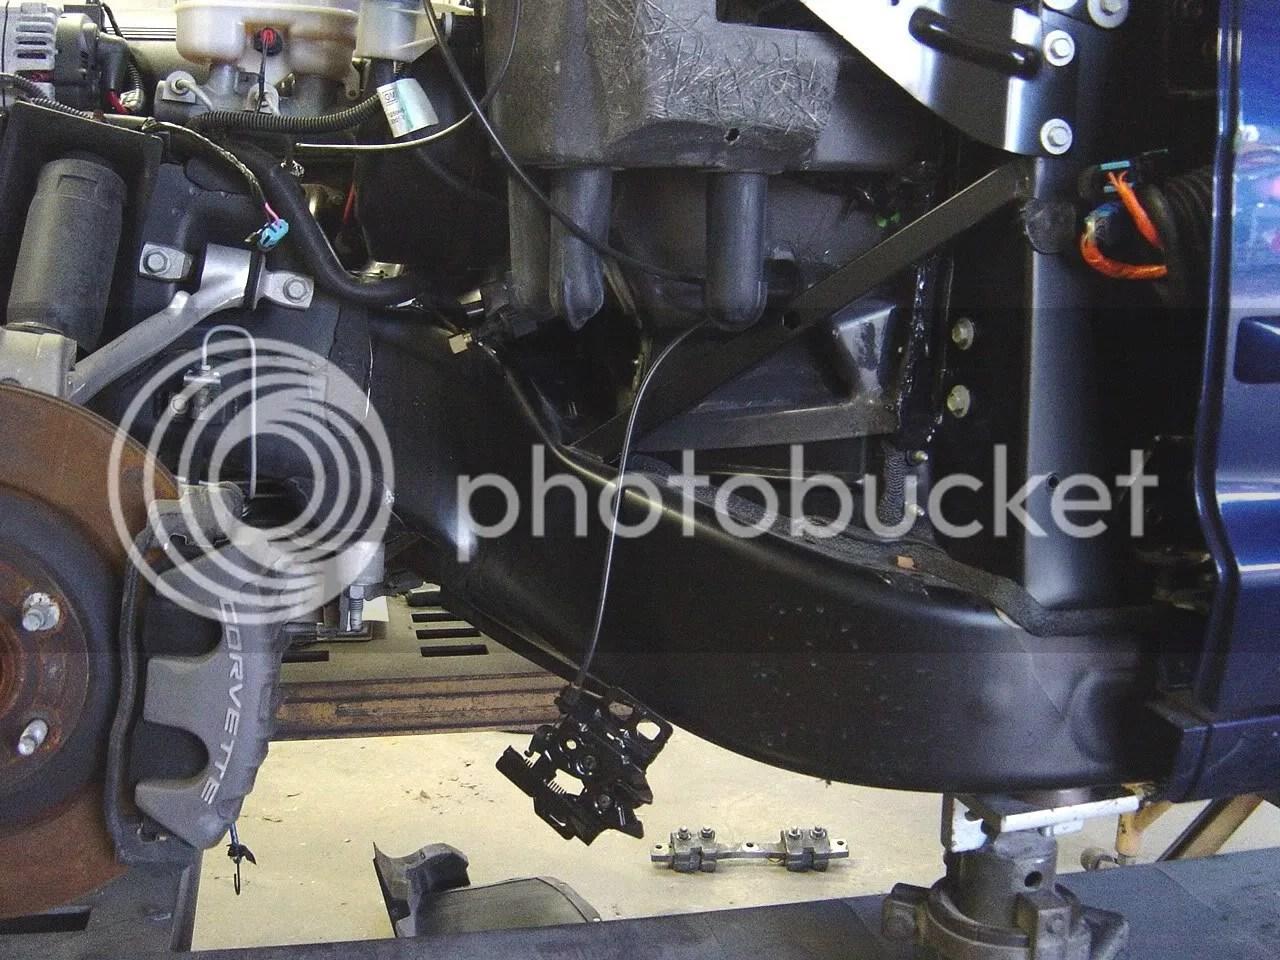 furnace blower humming when off 3 phase plug wiring diagram uk 2000 manual hvac motor replacement info